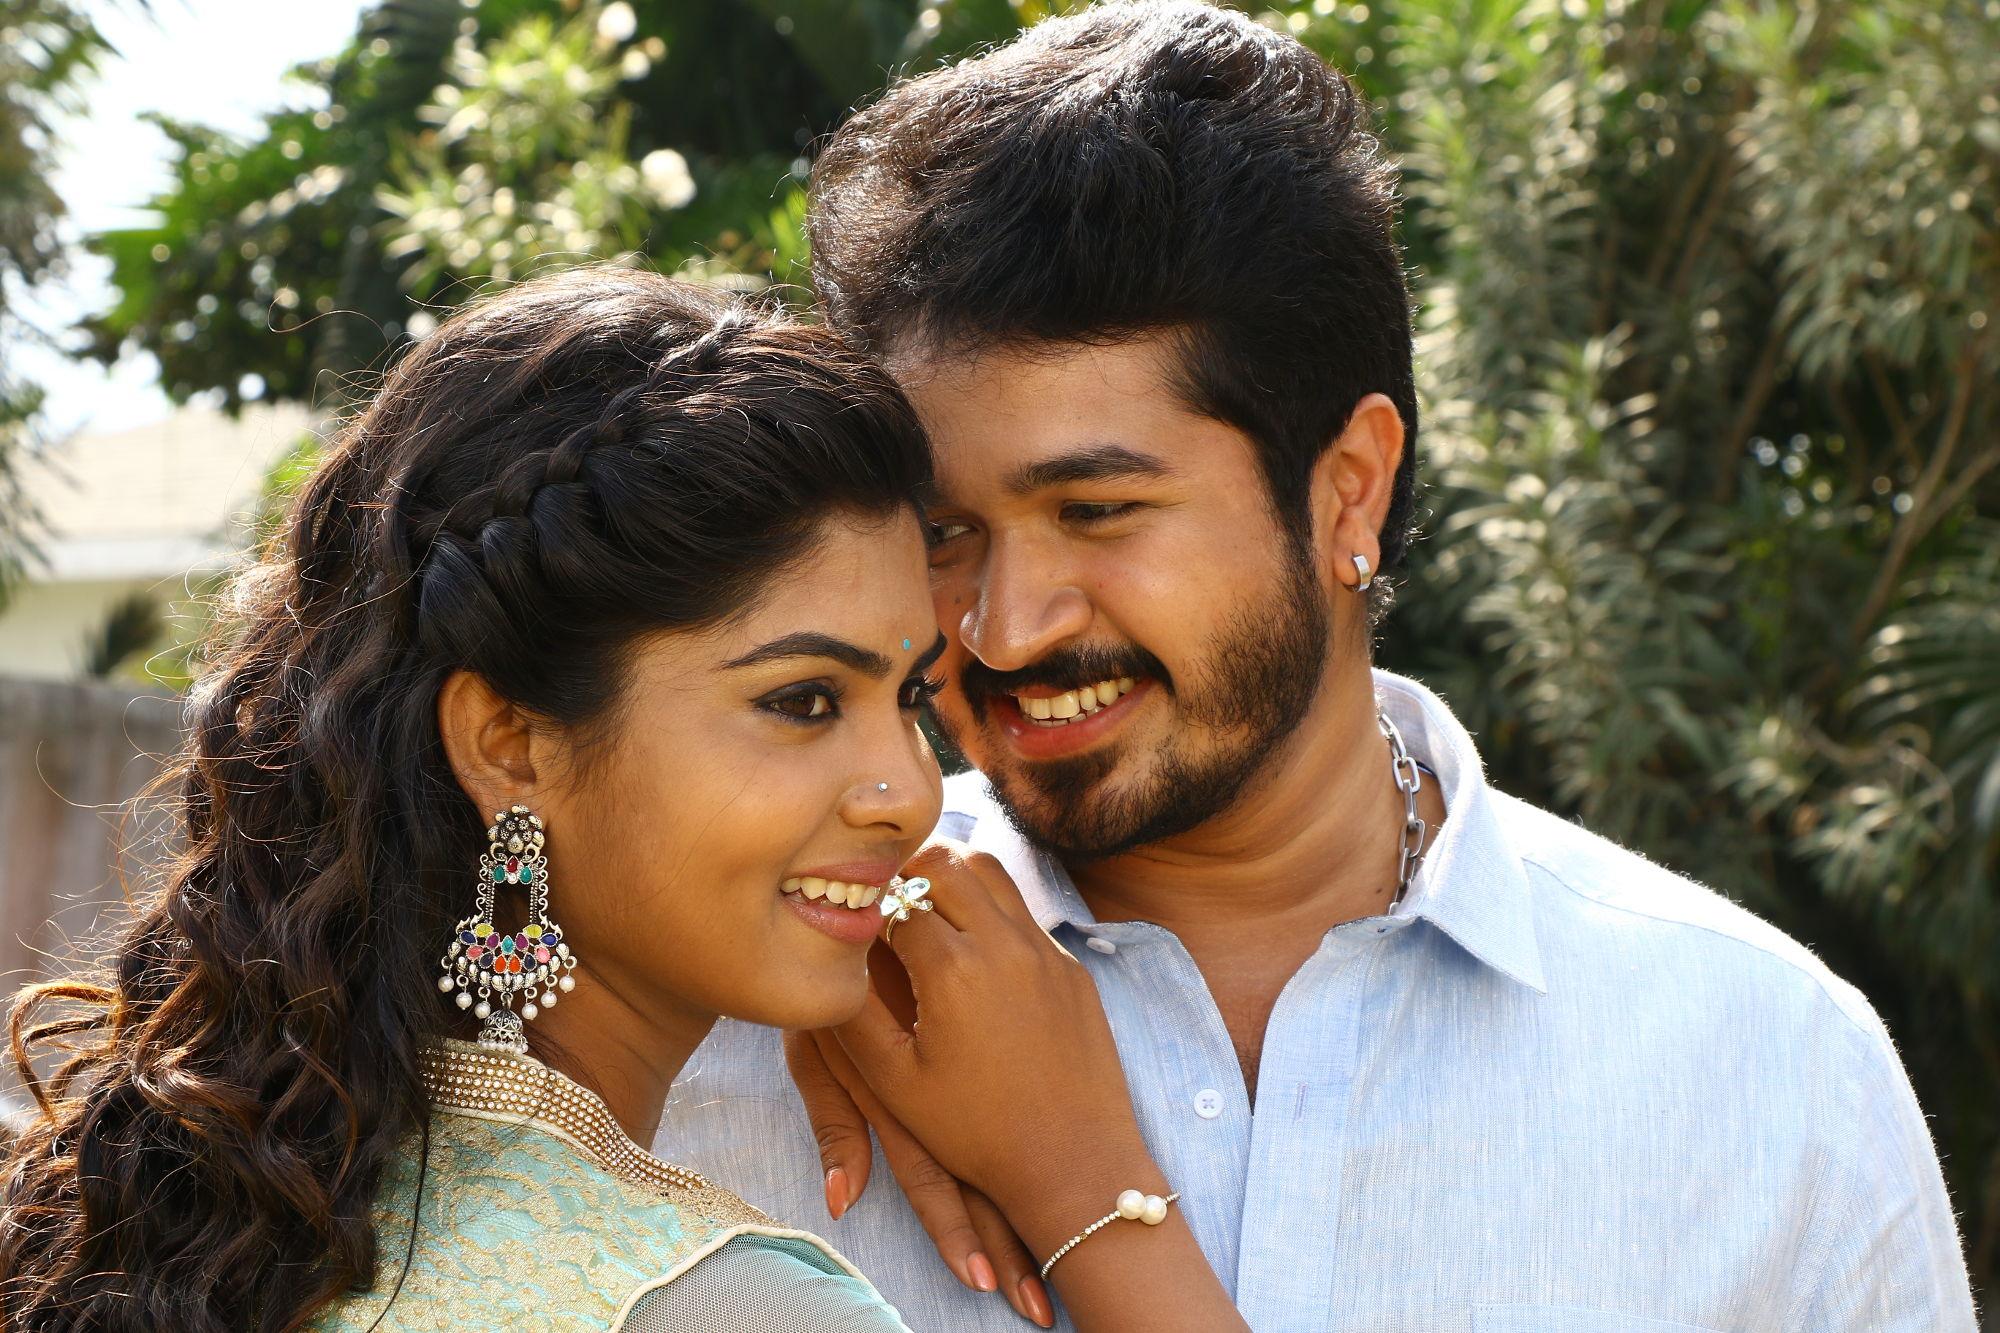 Actor SSR Ariyan, Actress Upasana Rai starring Karuthukkalai Pathivu Sei Movie Stills. Directed by Rajasekar.